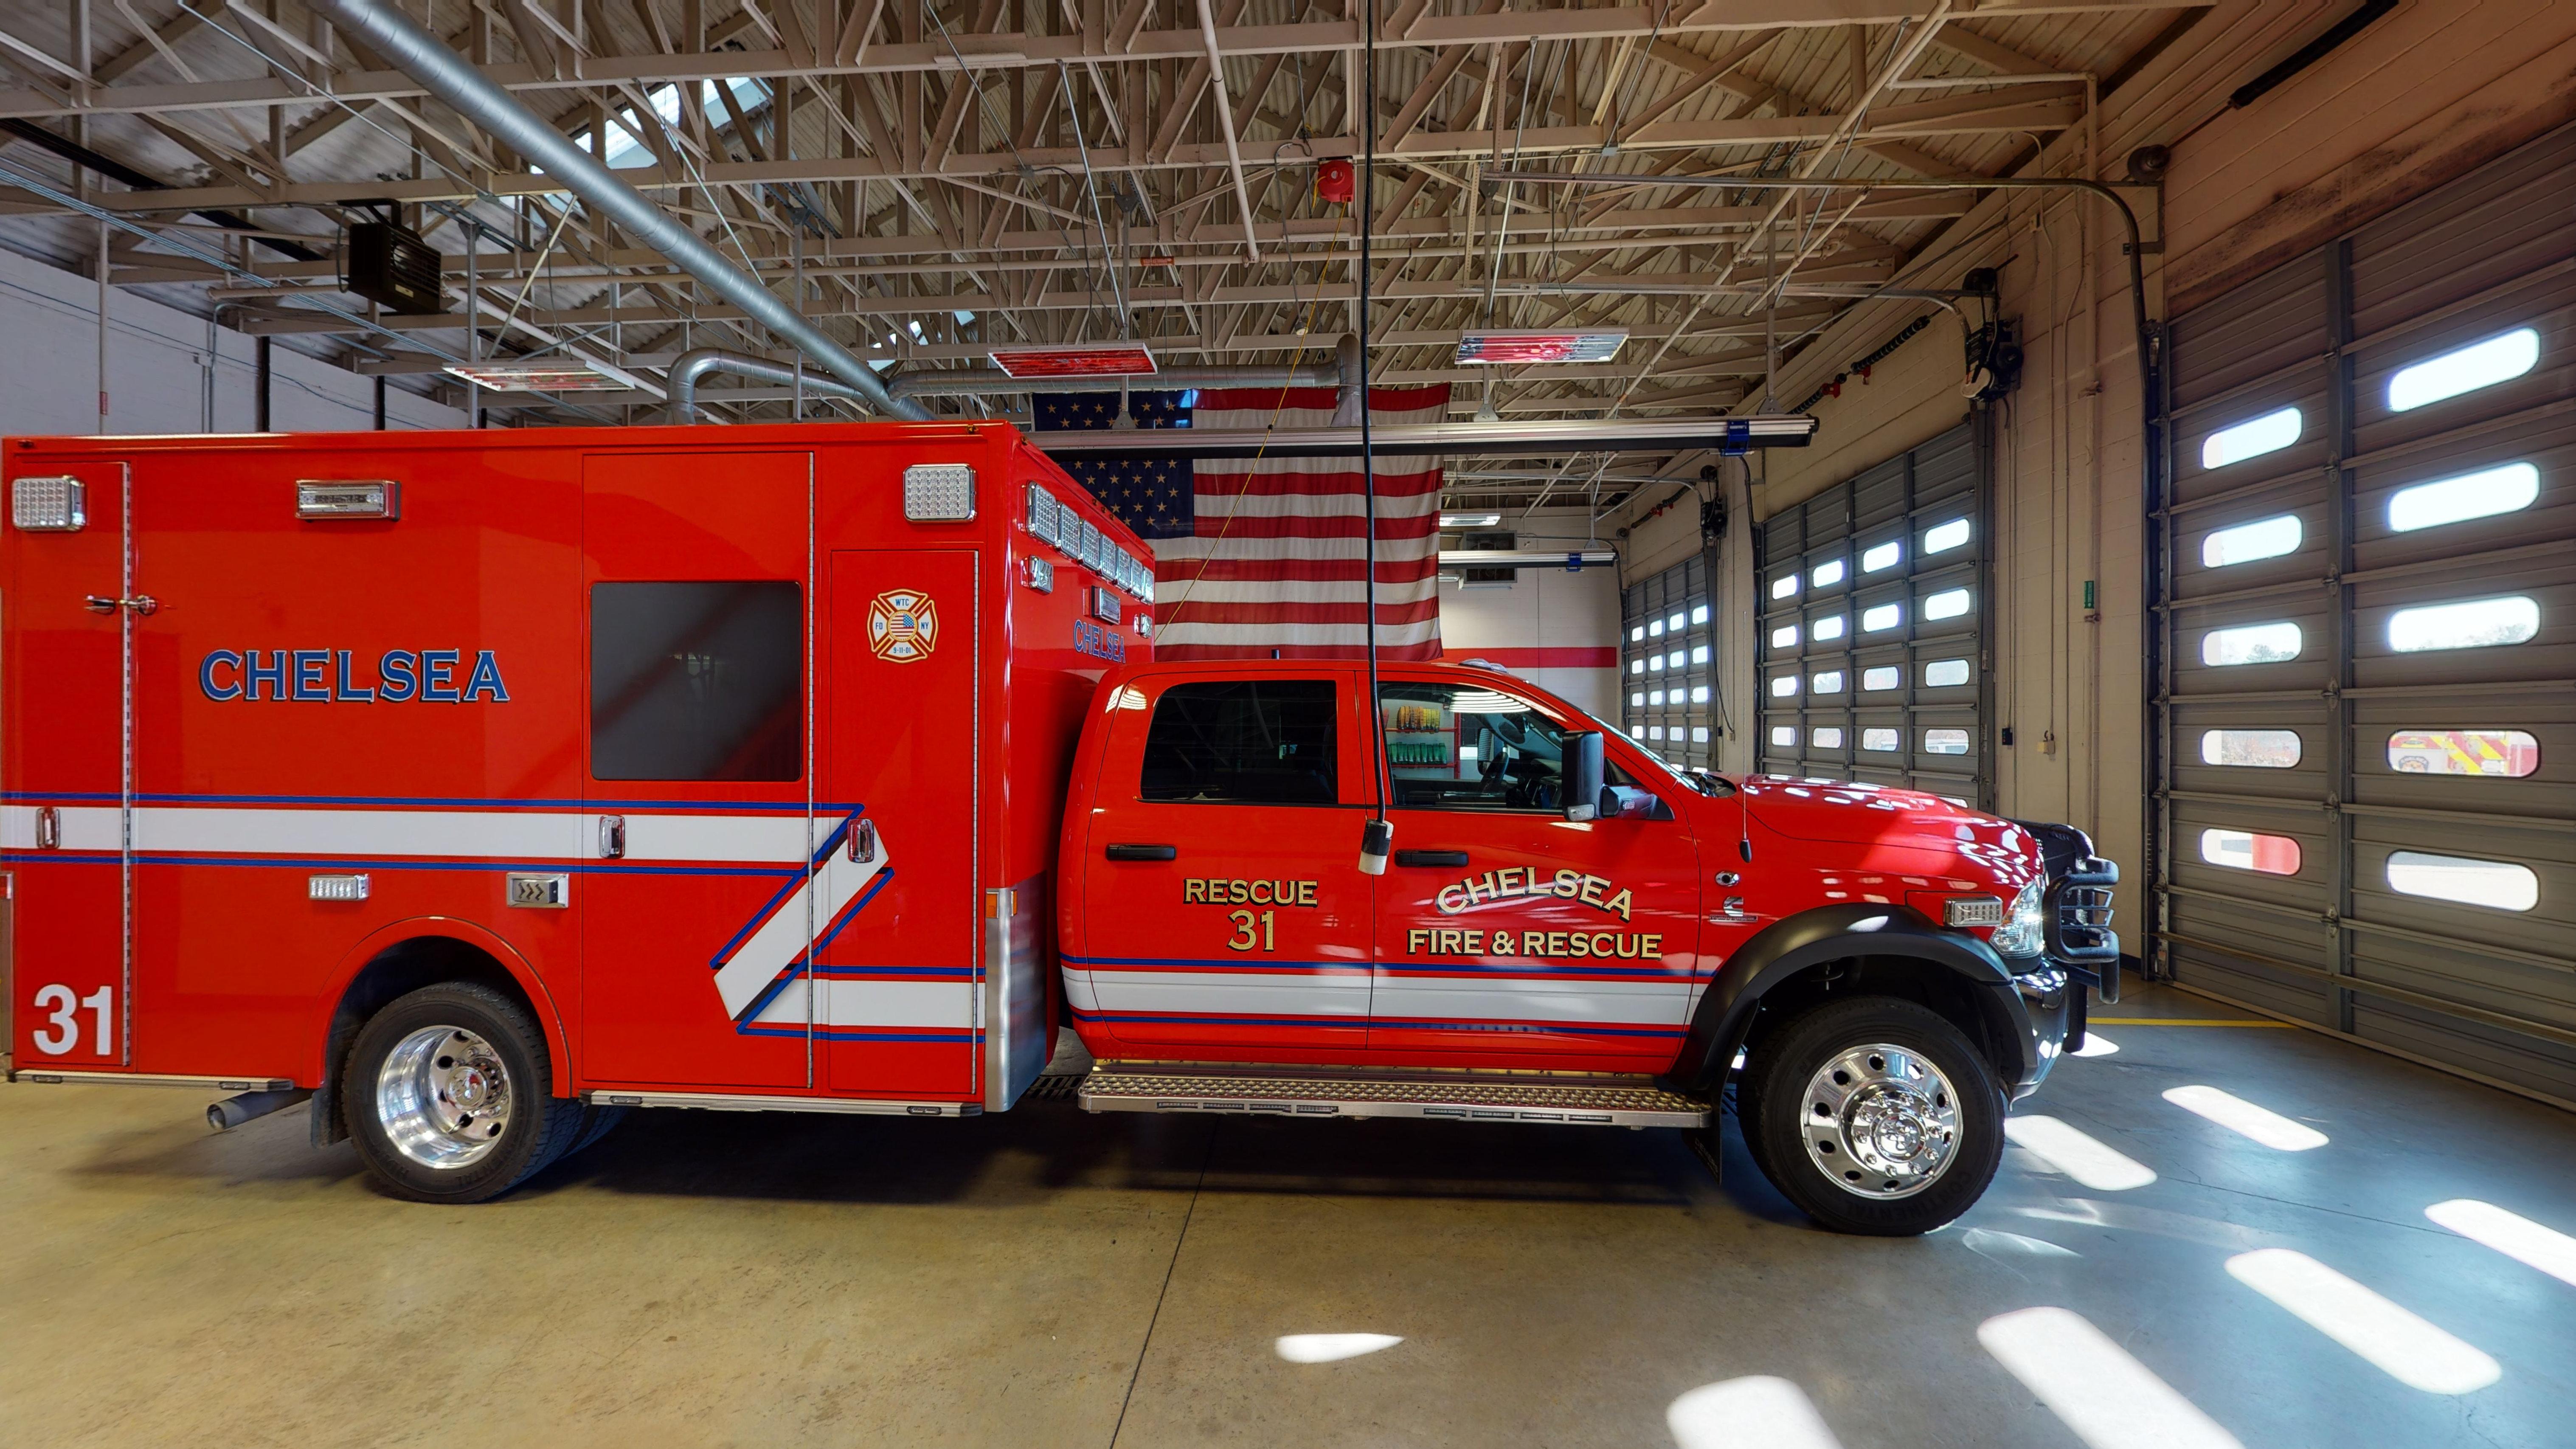 2_Chelsea-Fire-Rescue-Demers-151-06162021_101113